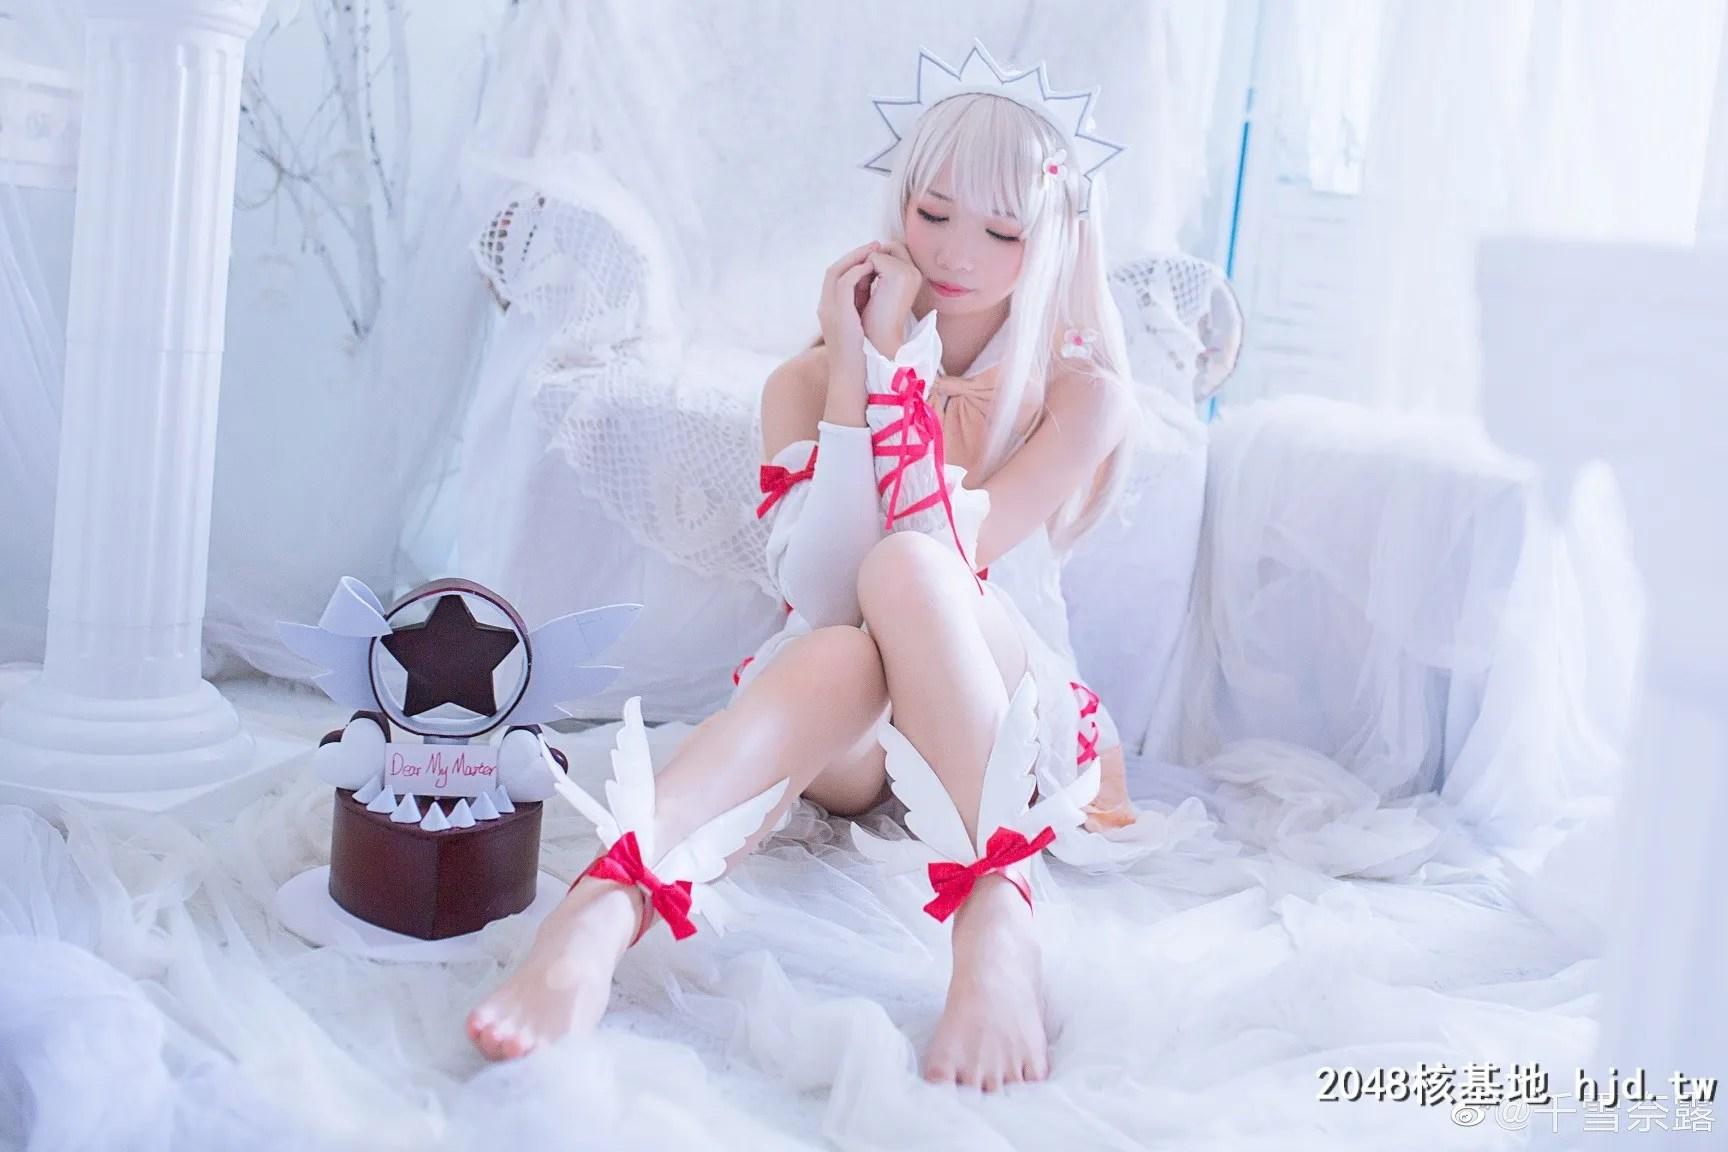 Fate/kaleid liner 魔法少女☆伊 莉 雅@千雪奈露 (9P)插图(5)